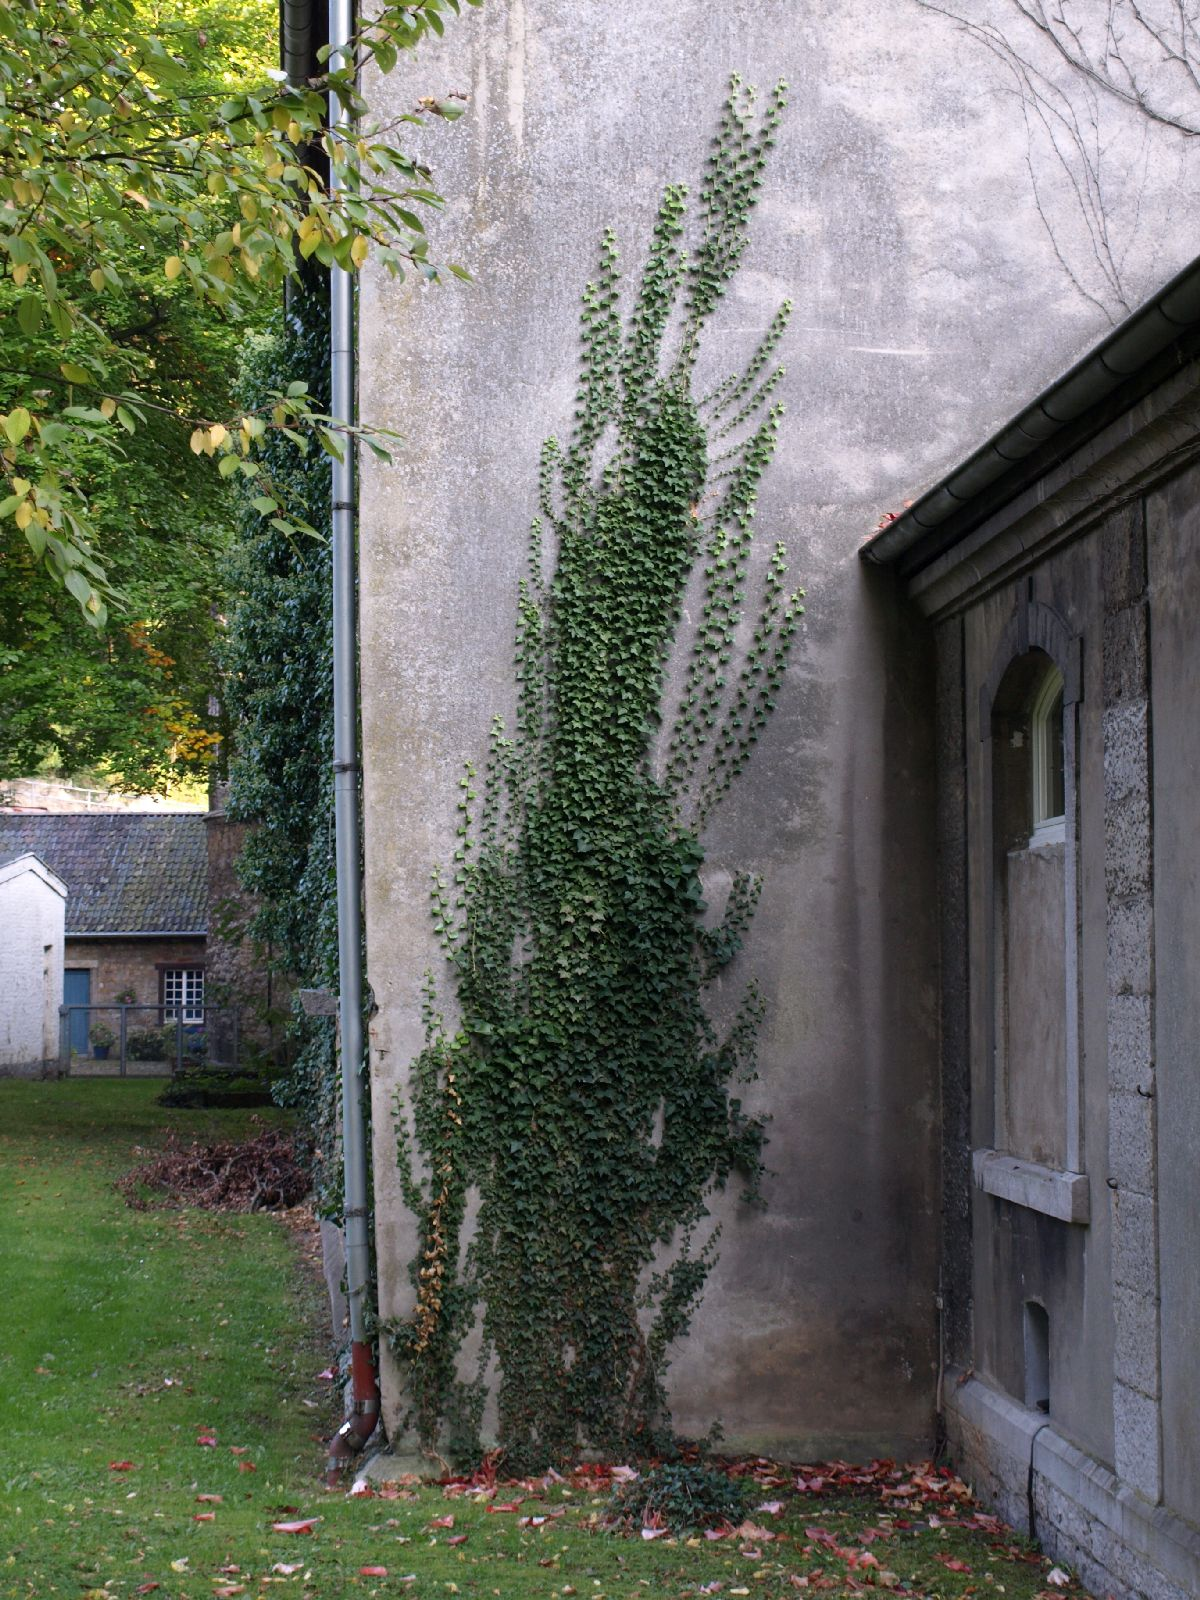 Pflanzen-Baum-Foto_Textur_B_P9285575